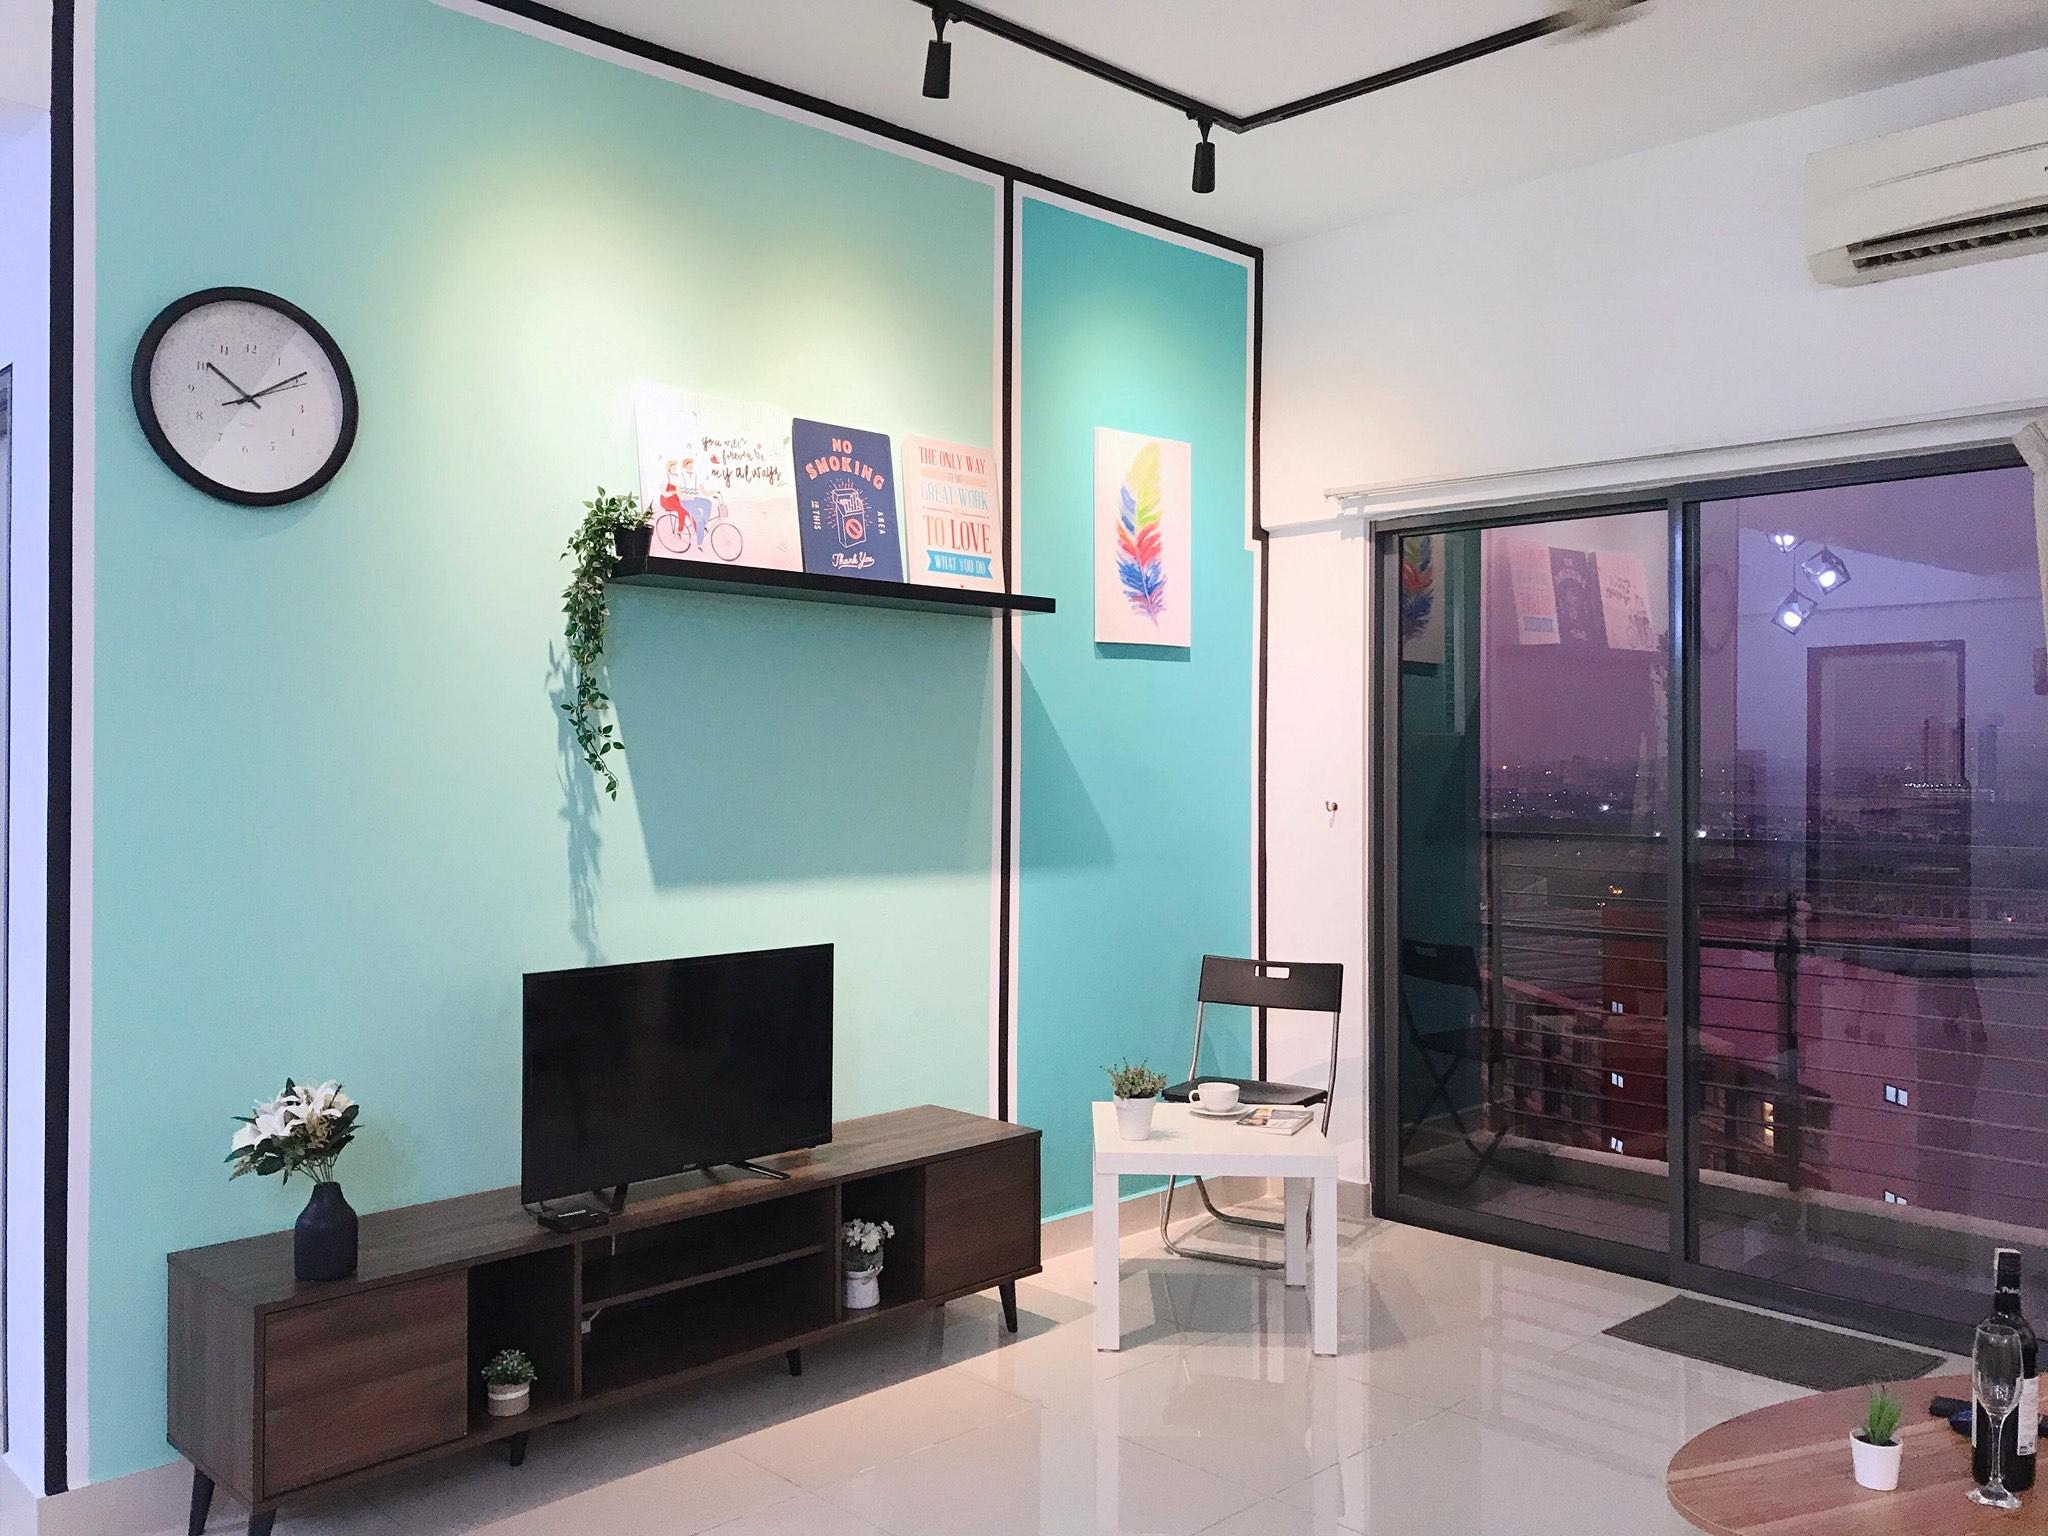 6 8 Pax SetiaWalk 5min LRT Cozy Apartment Puchong